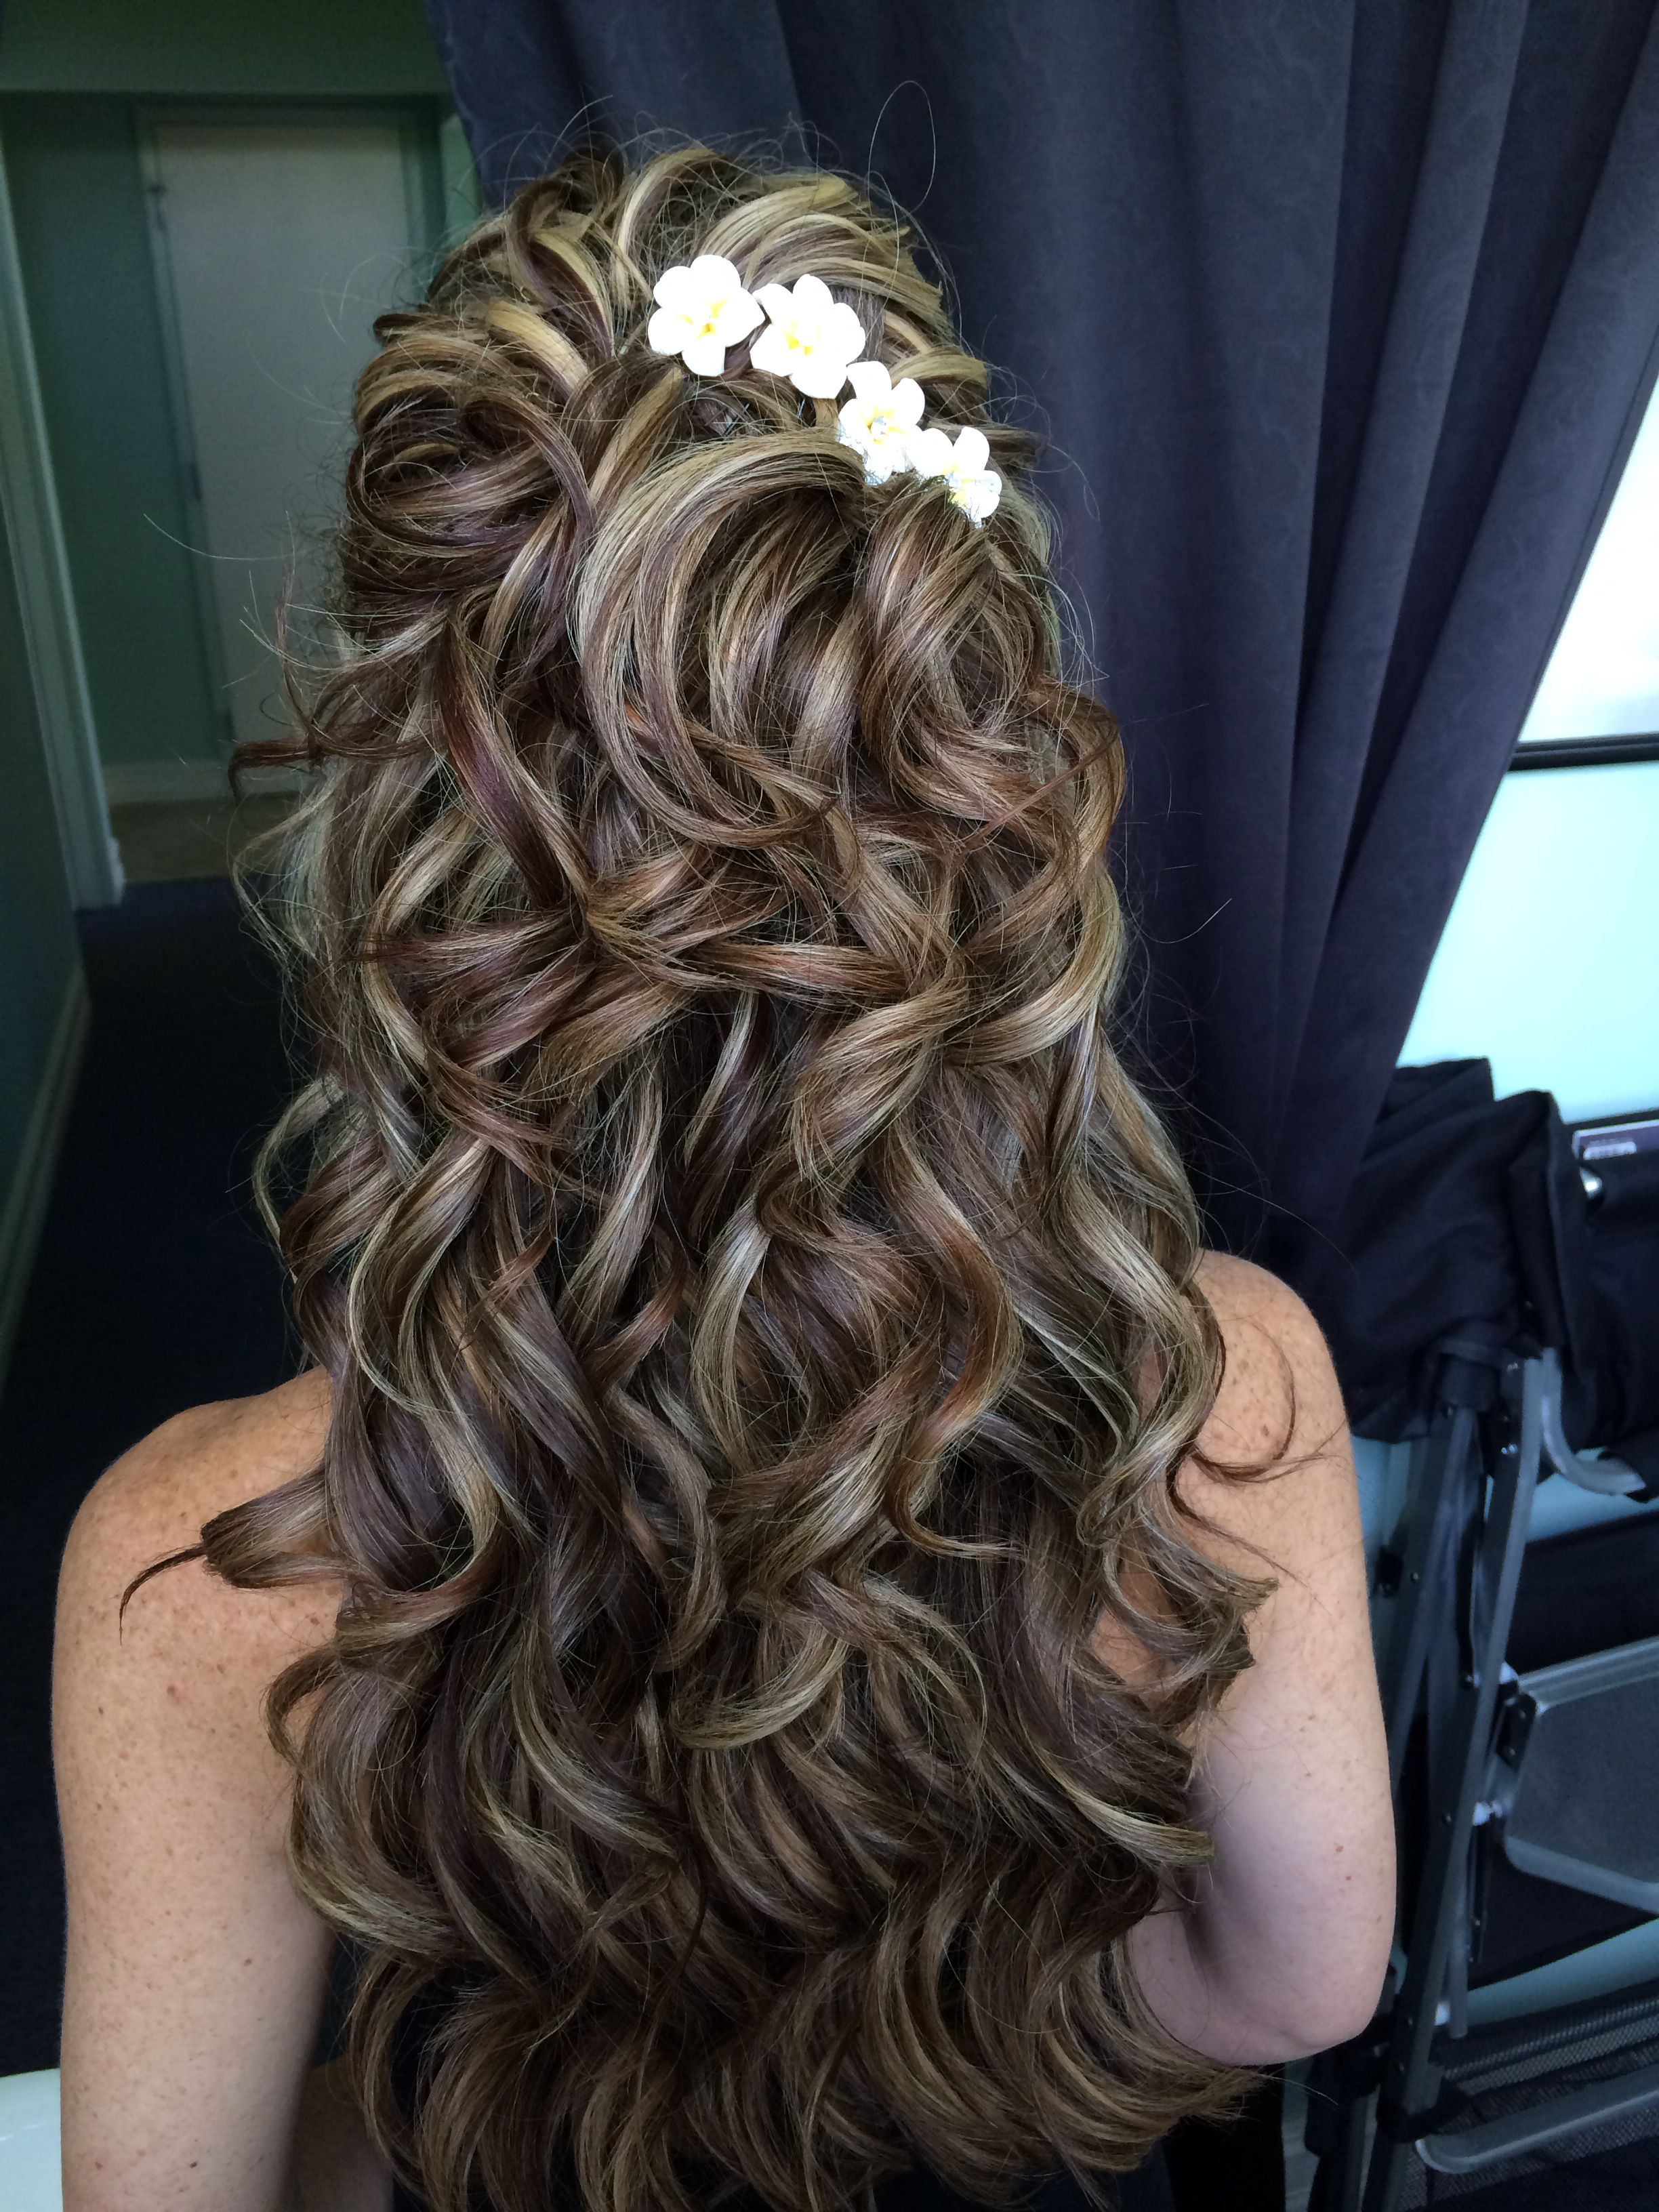 Www.BeautyCouture... Garden wedding hippy bohemian hair. Romantic hair style. Br...